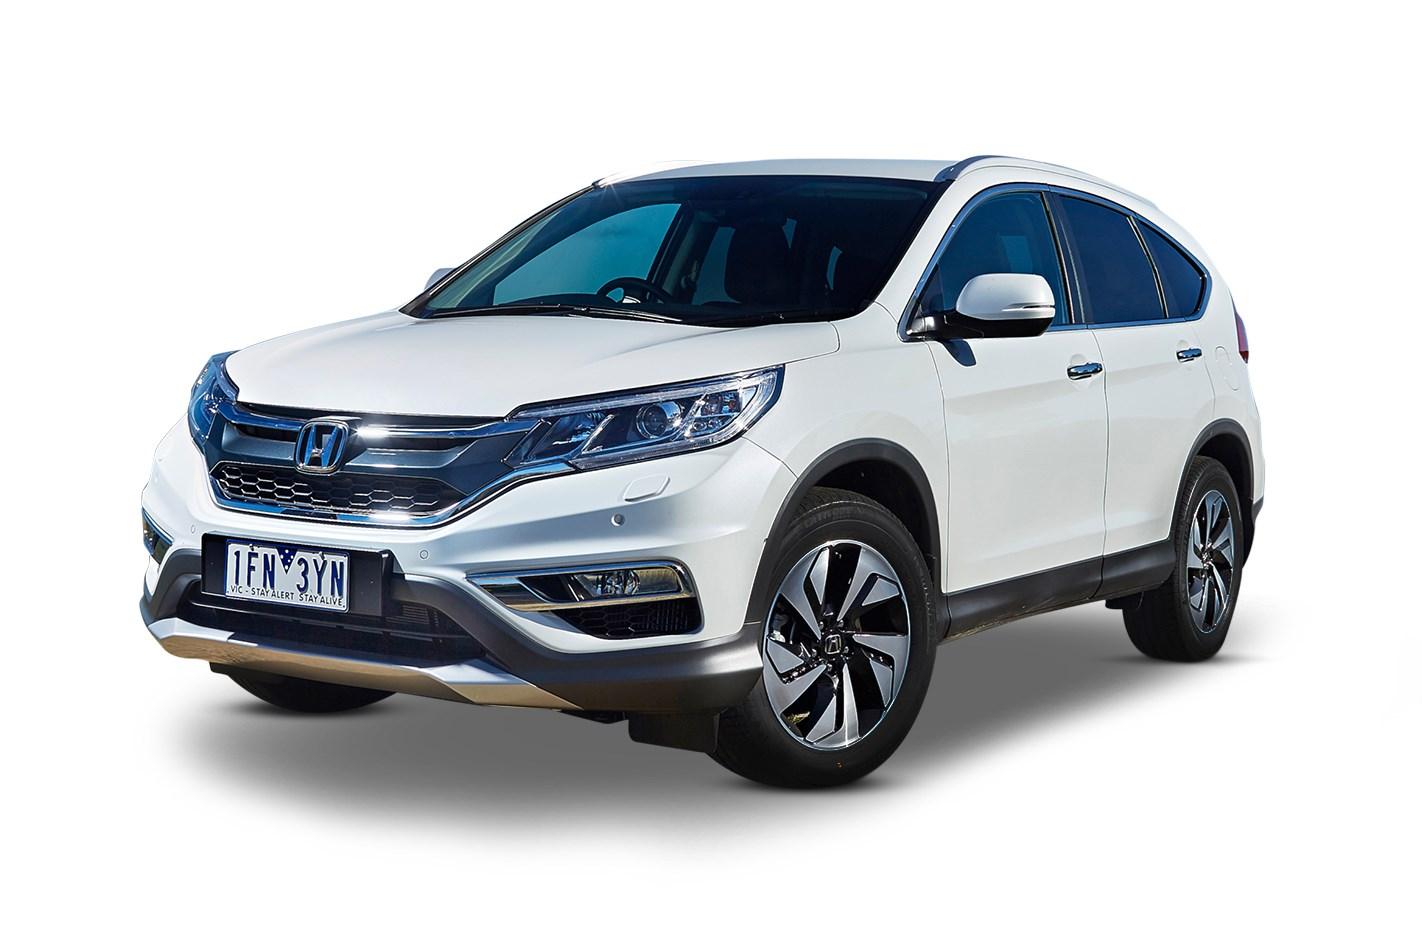 2016 honda crv dti l 4x4 limited edition 4d wagon